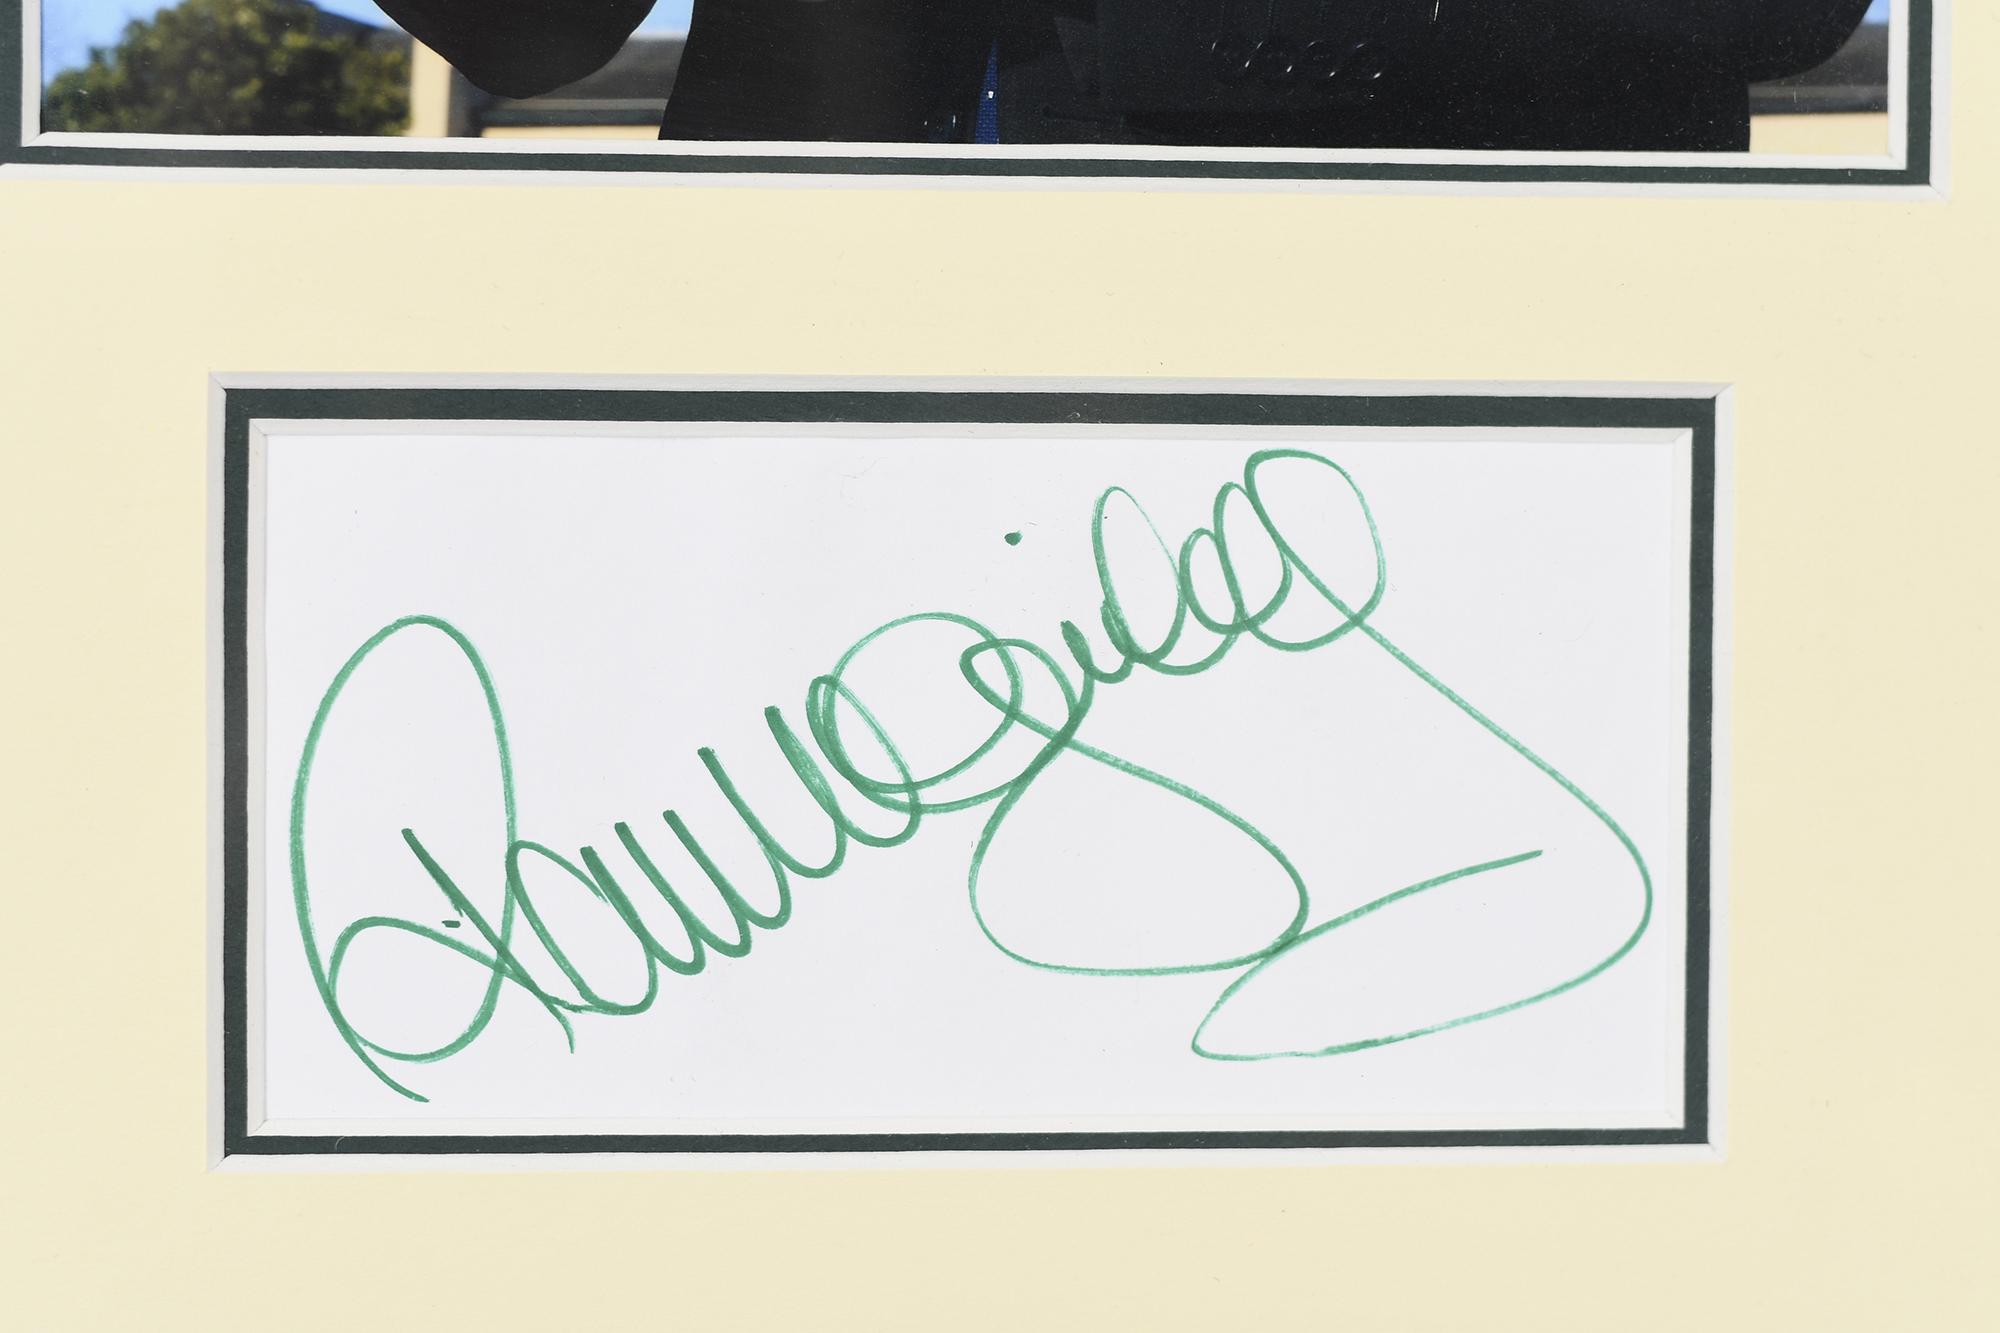 Paul Mcginley Framed Signature Presentation - Image 4 of 6